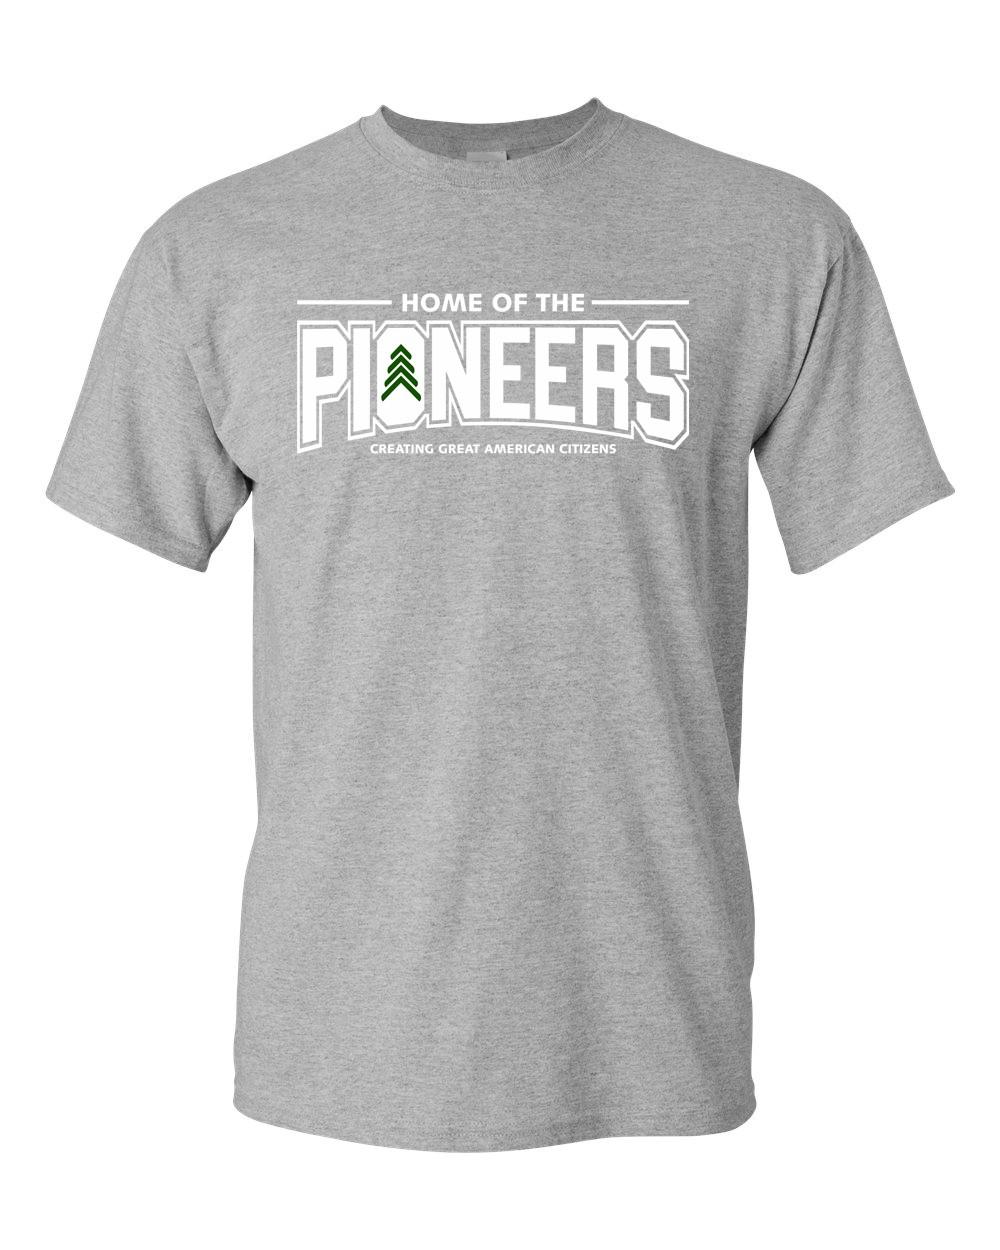 Pioneers 100% Polyester Moisture-Wicking Tees